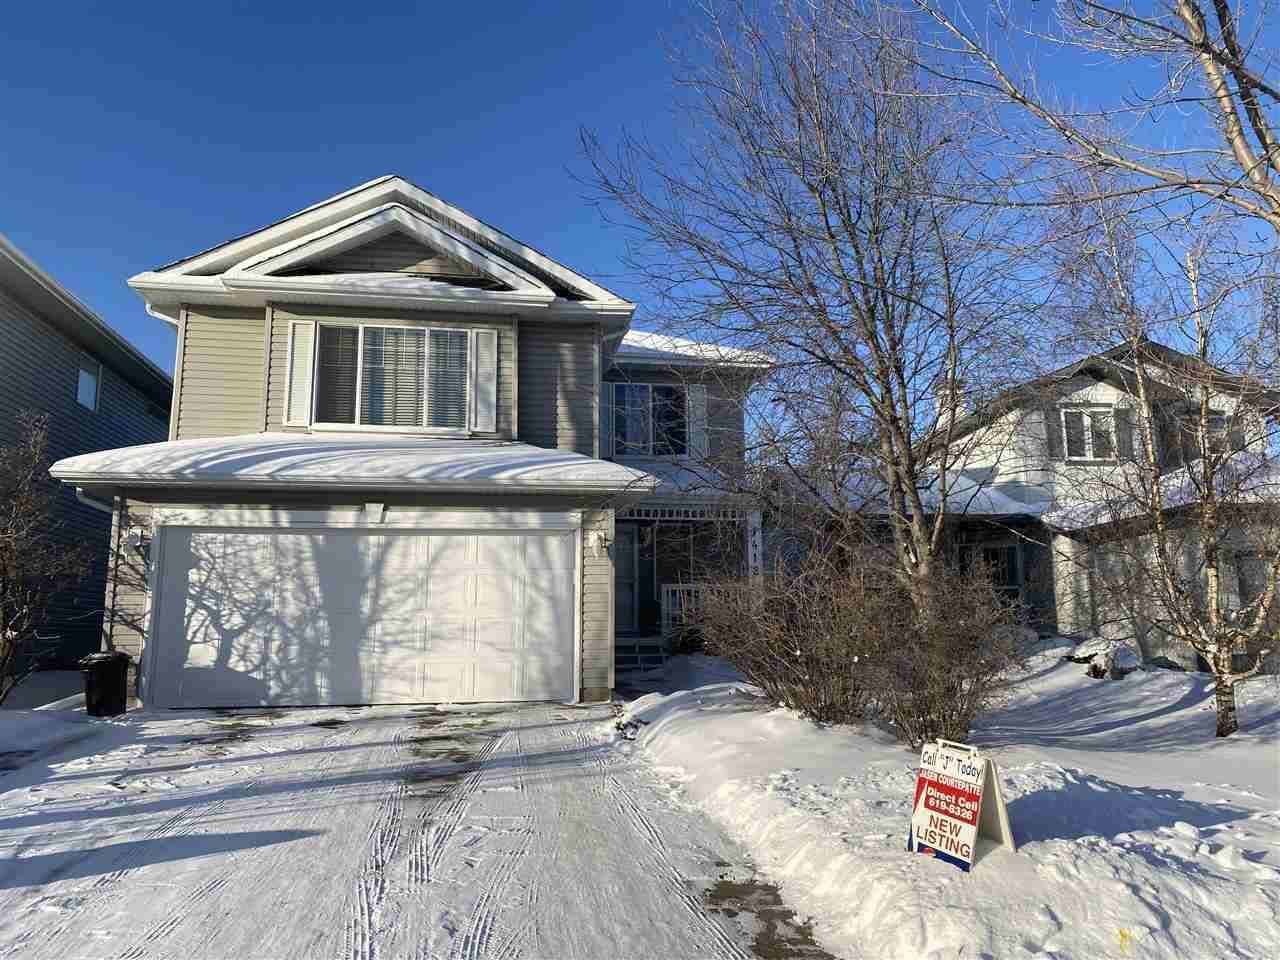 House for sale at 1412 Breckenridge Dr Nw Edmonton Alberta - MLS: E4184234